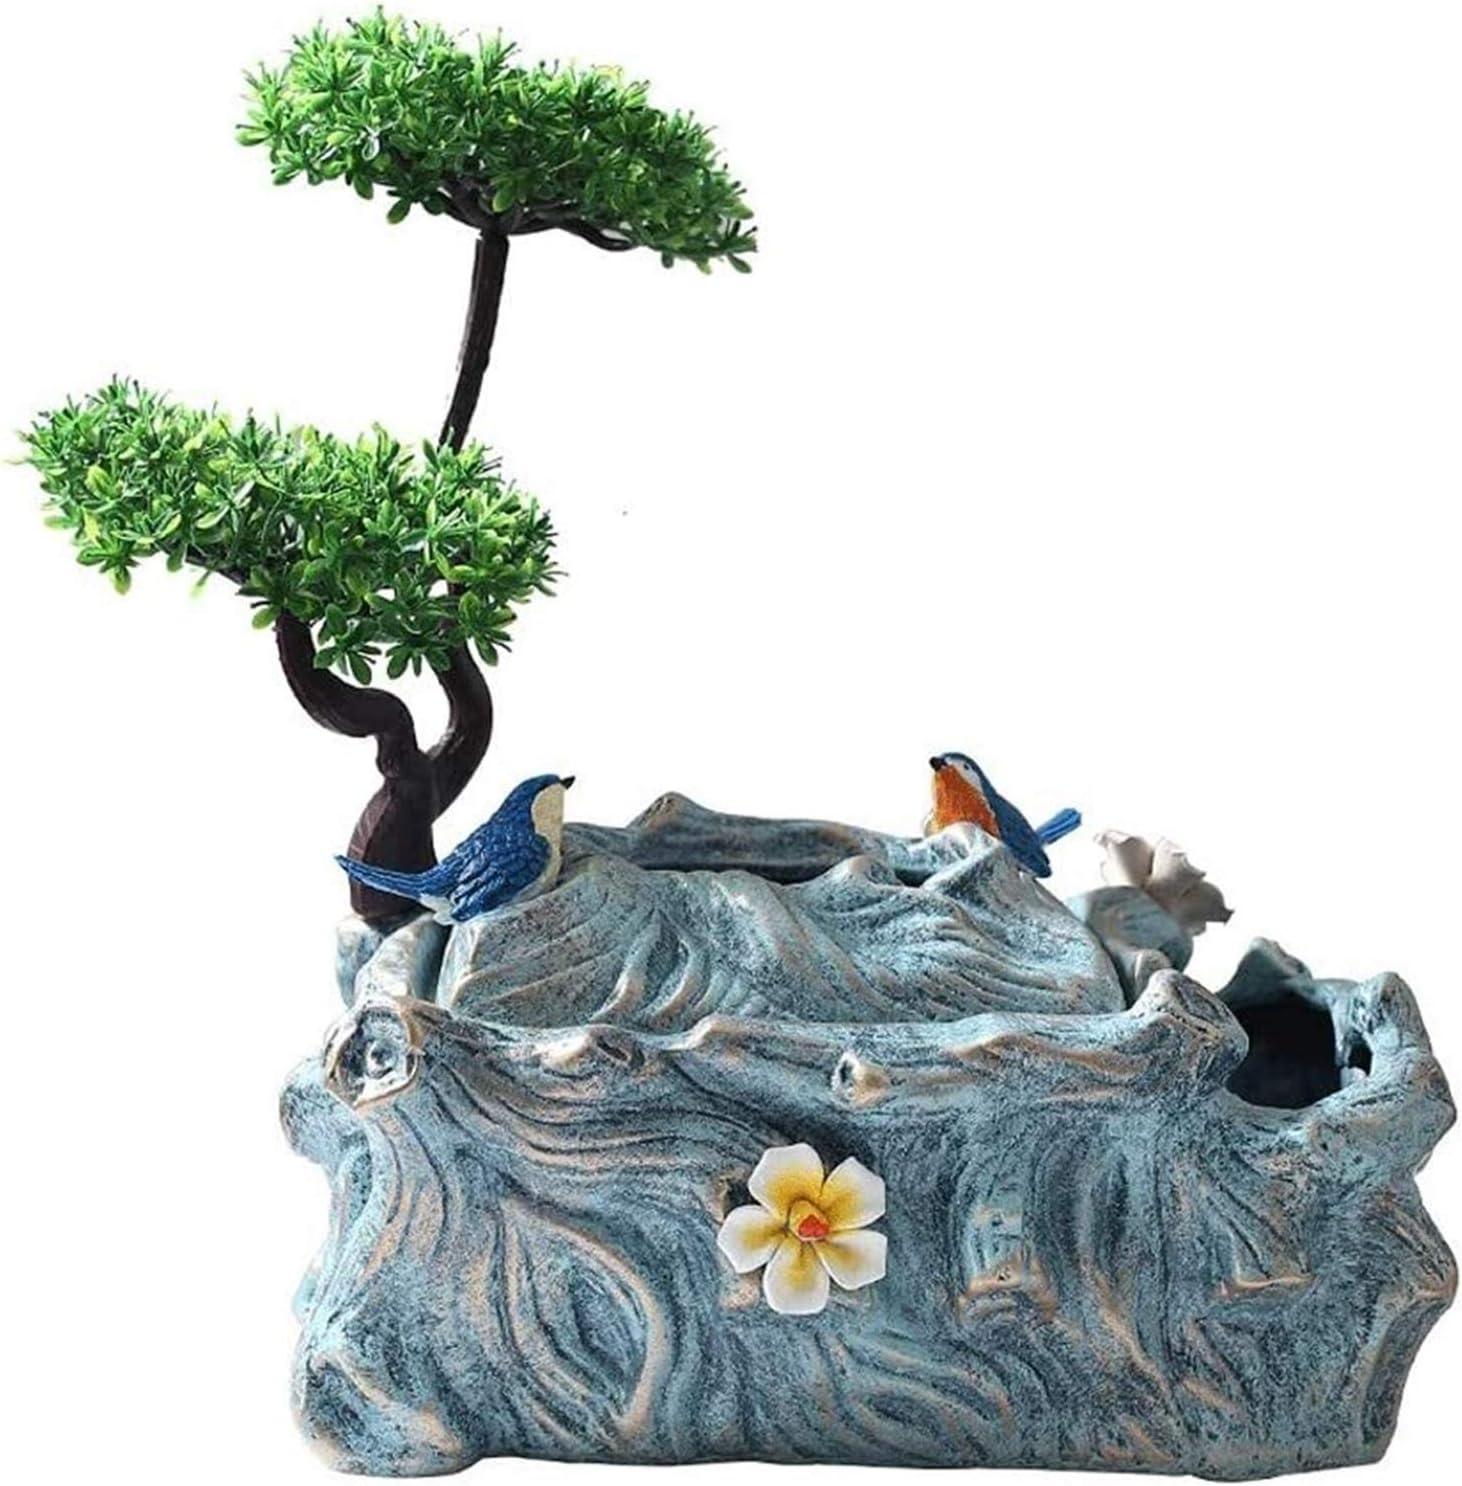 Tissue Box Holder Hand-Carved Decorative Bird Oklahoma City Mall Tiss Dealing full price reduction Flower